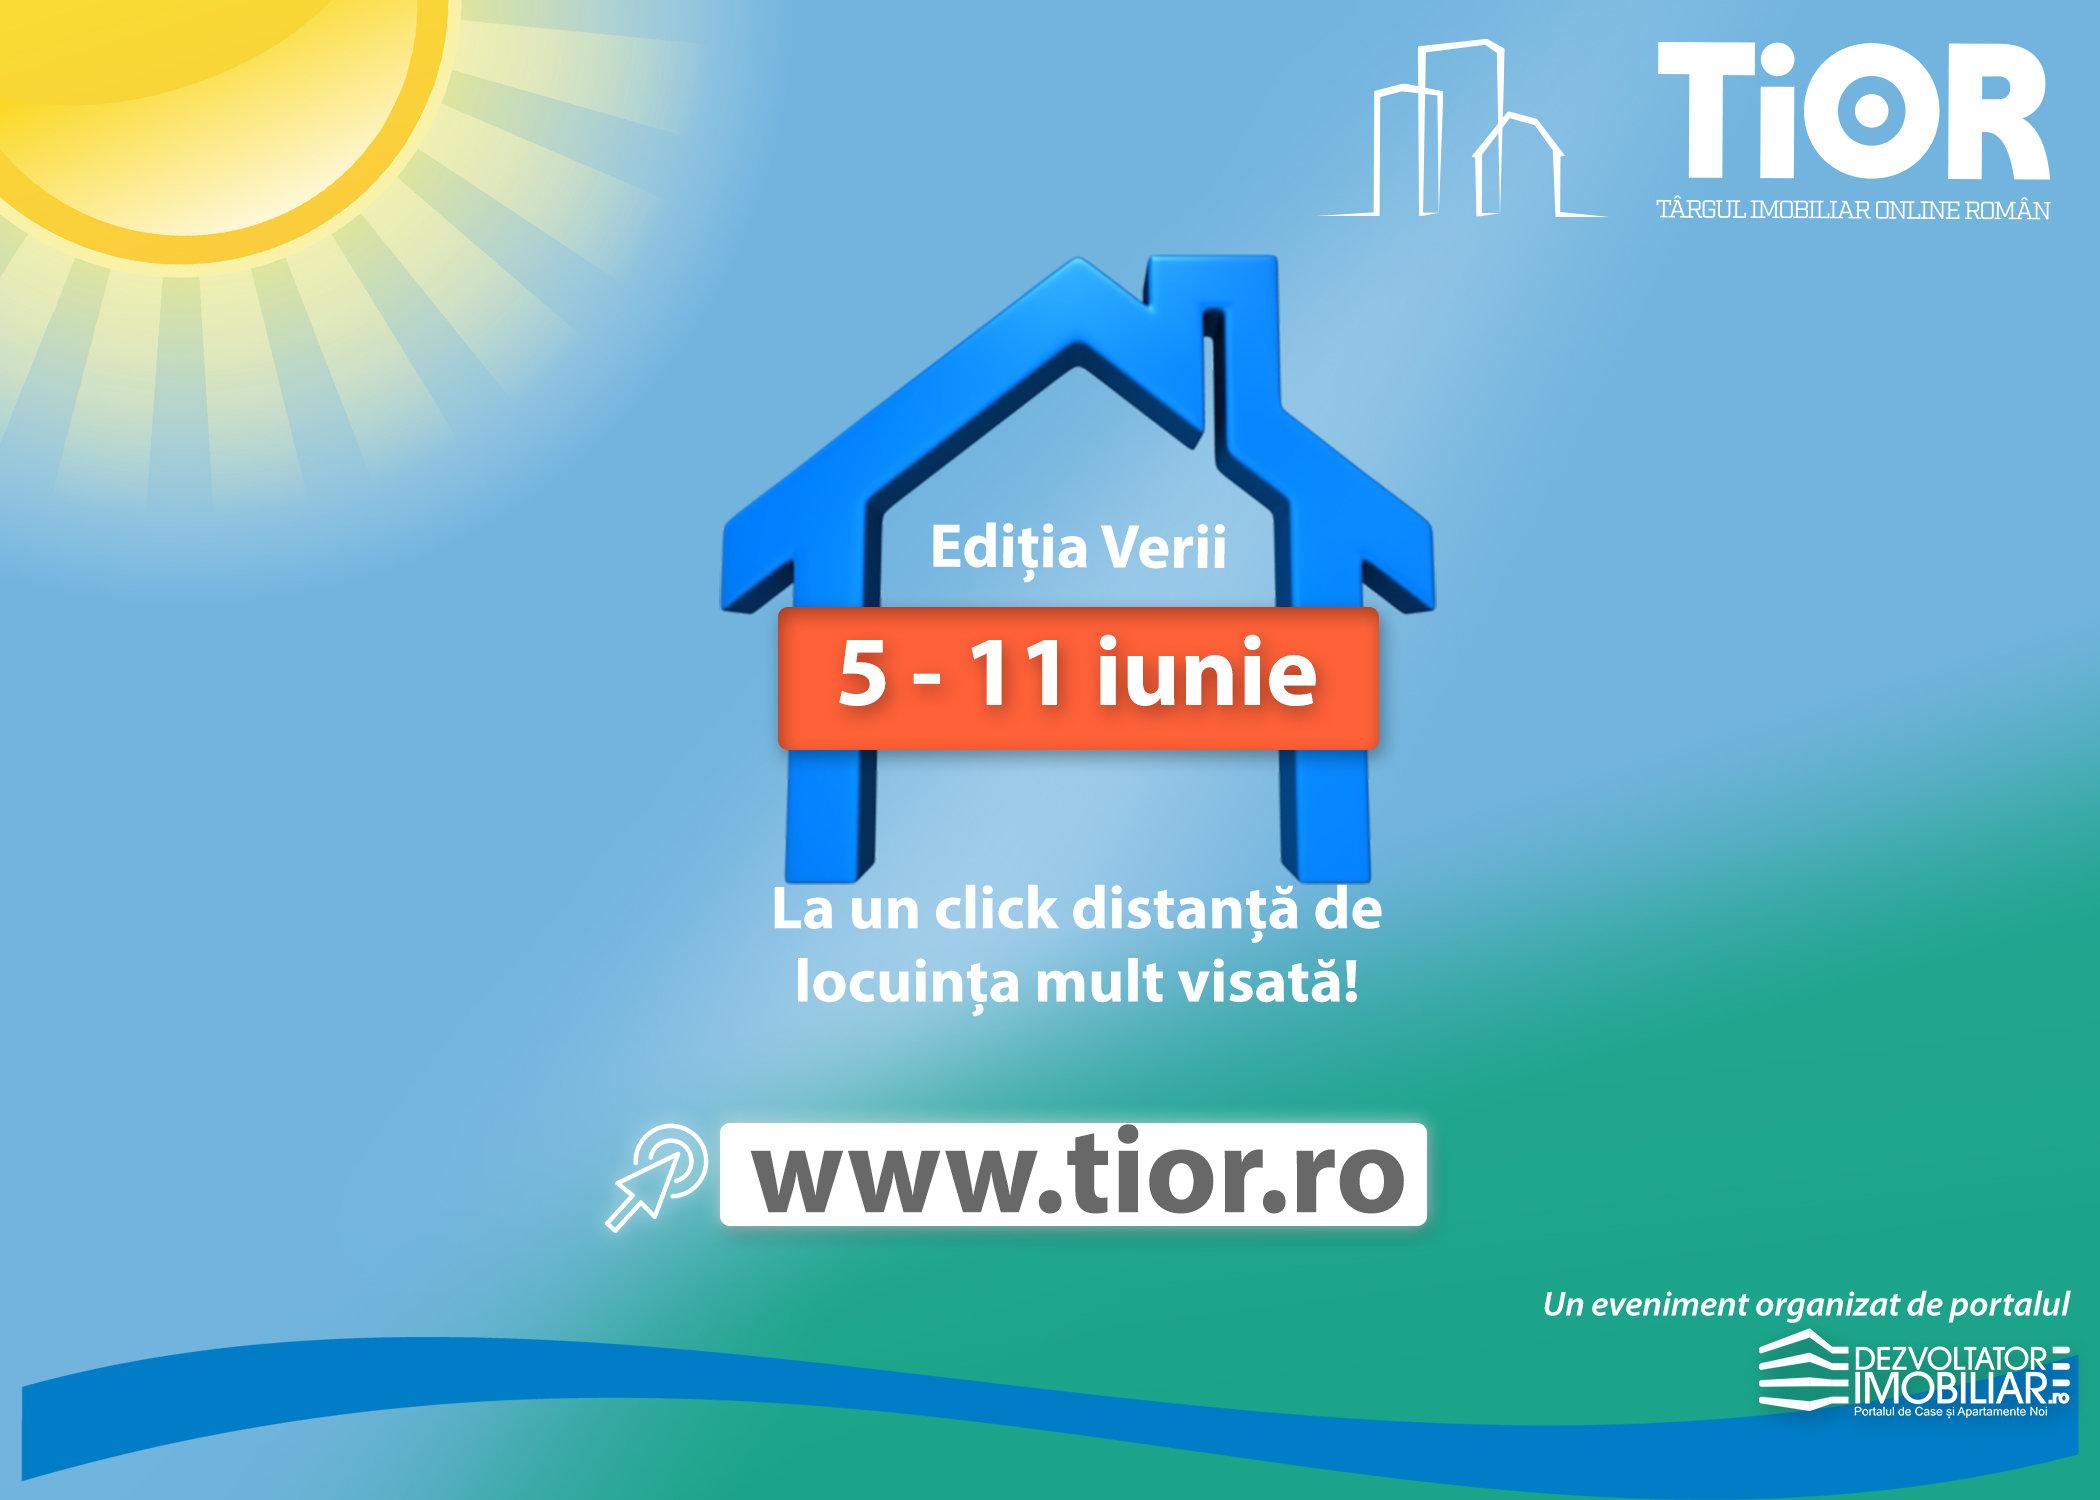 TIOR – Targul Imobiliar Online Roman, editia a doua: 5 – 11 iunie - Targ Imobiliar Online Roman